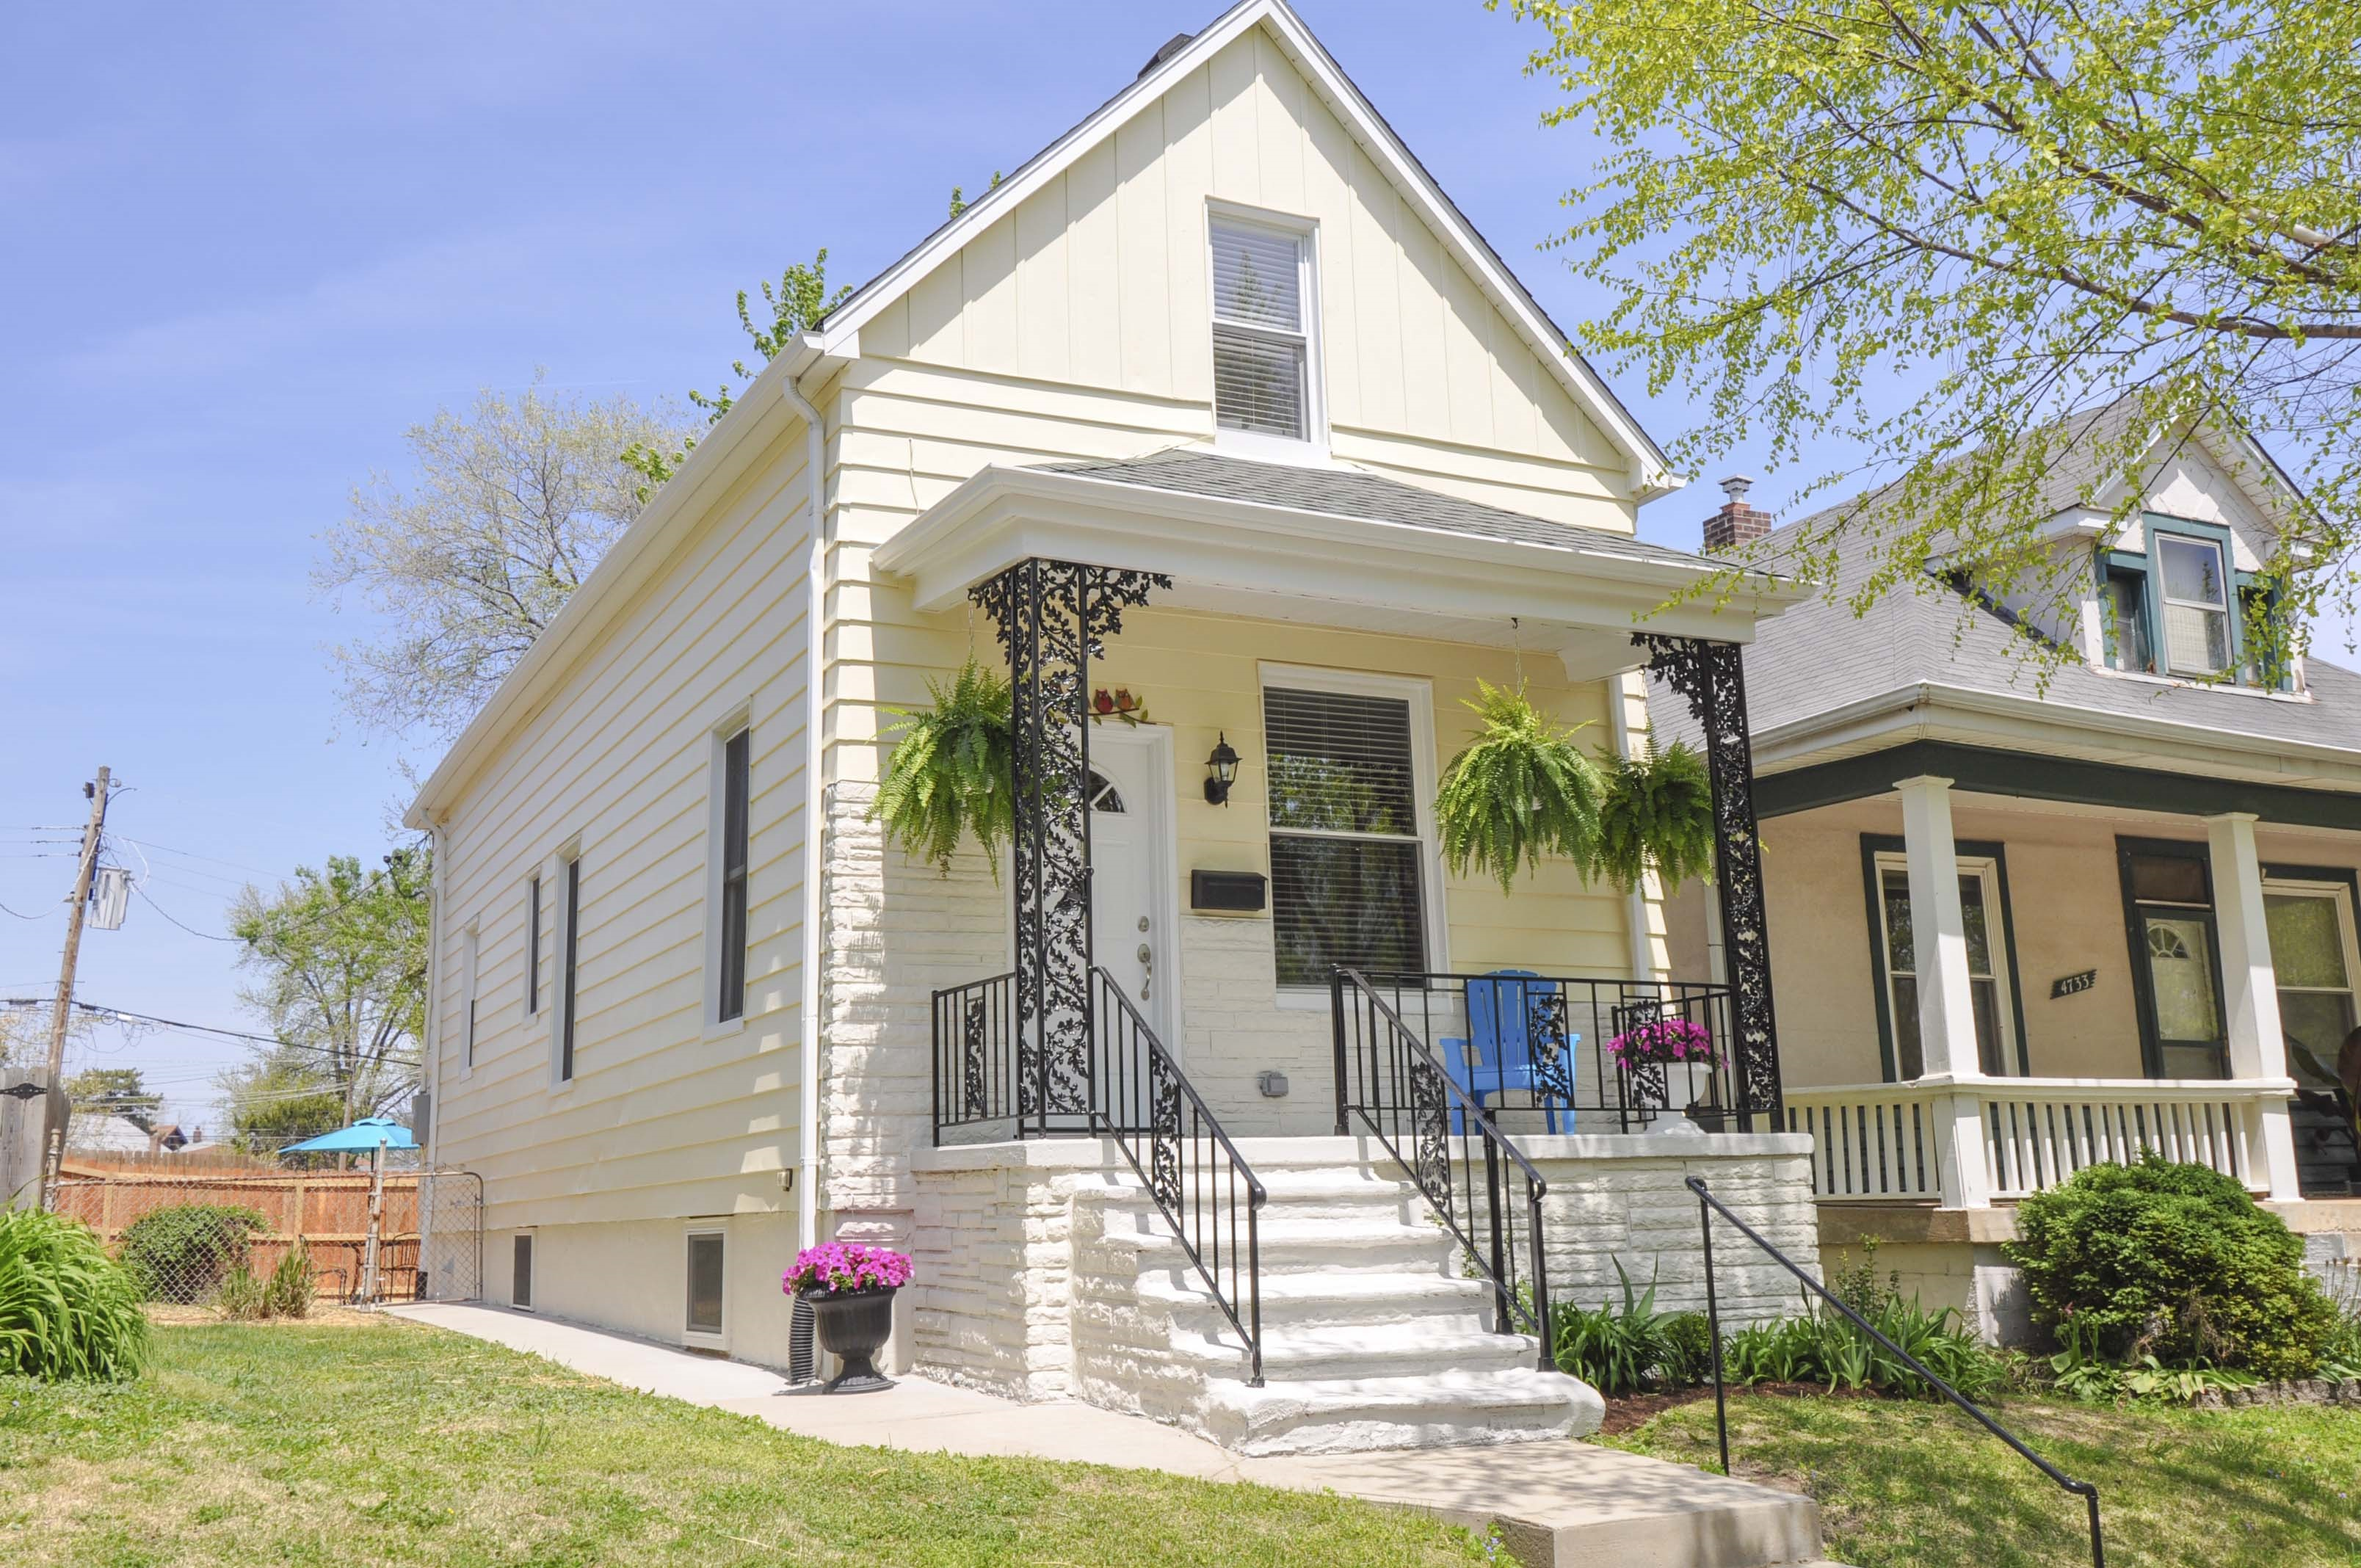 4737 Hummel Ave St Louis MO 63116 – Princeton Heights